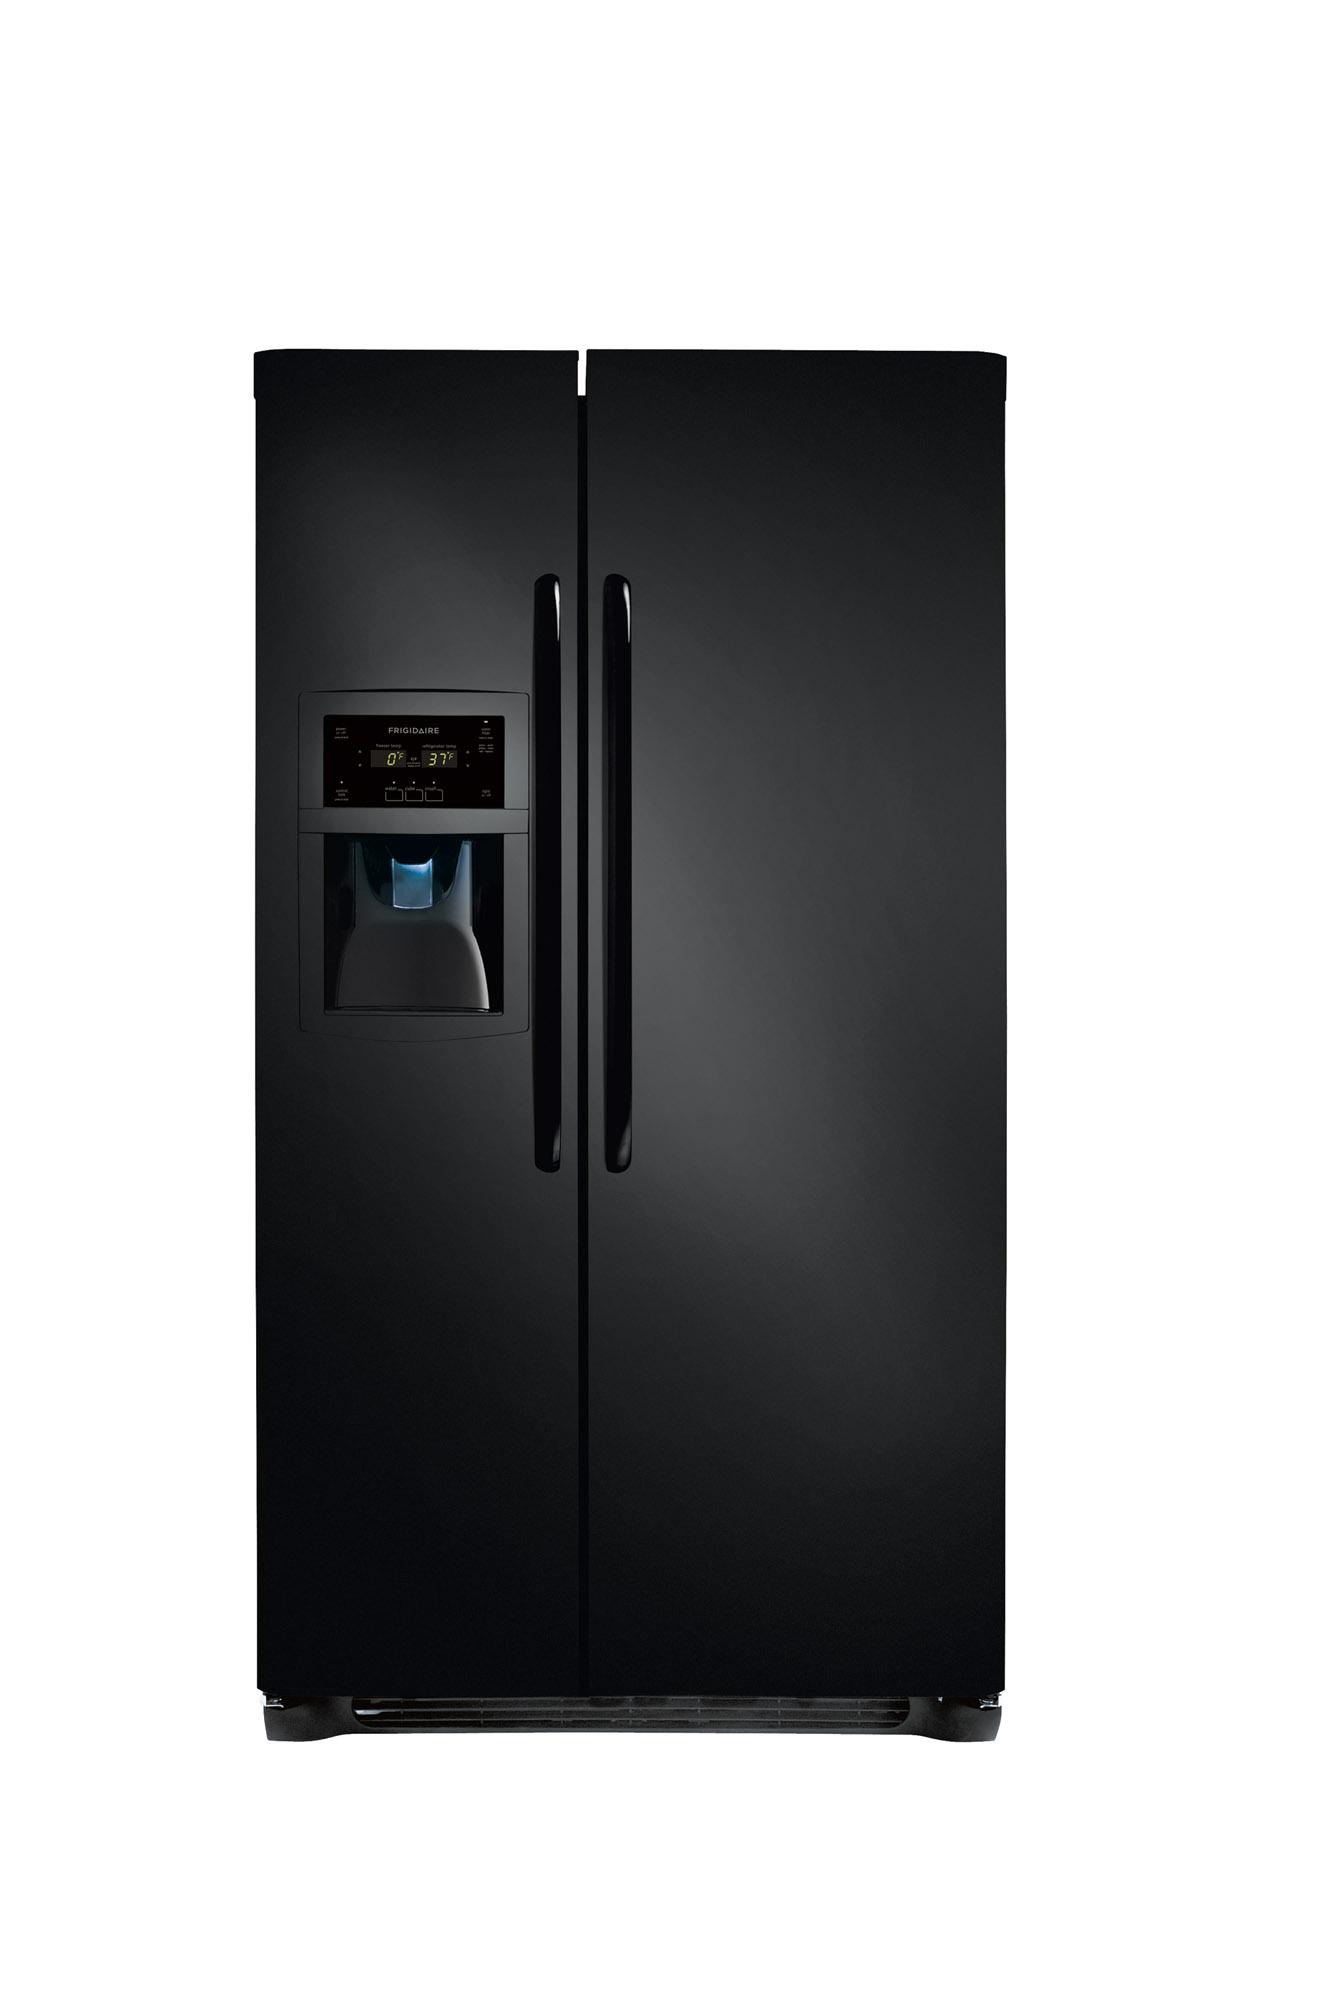 Frigidaire Refrigerator Model FFSC2323LE3 Parts